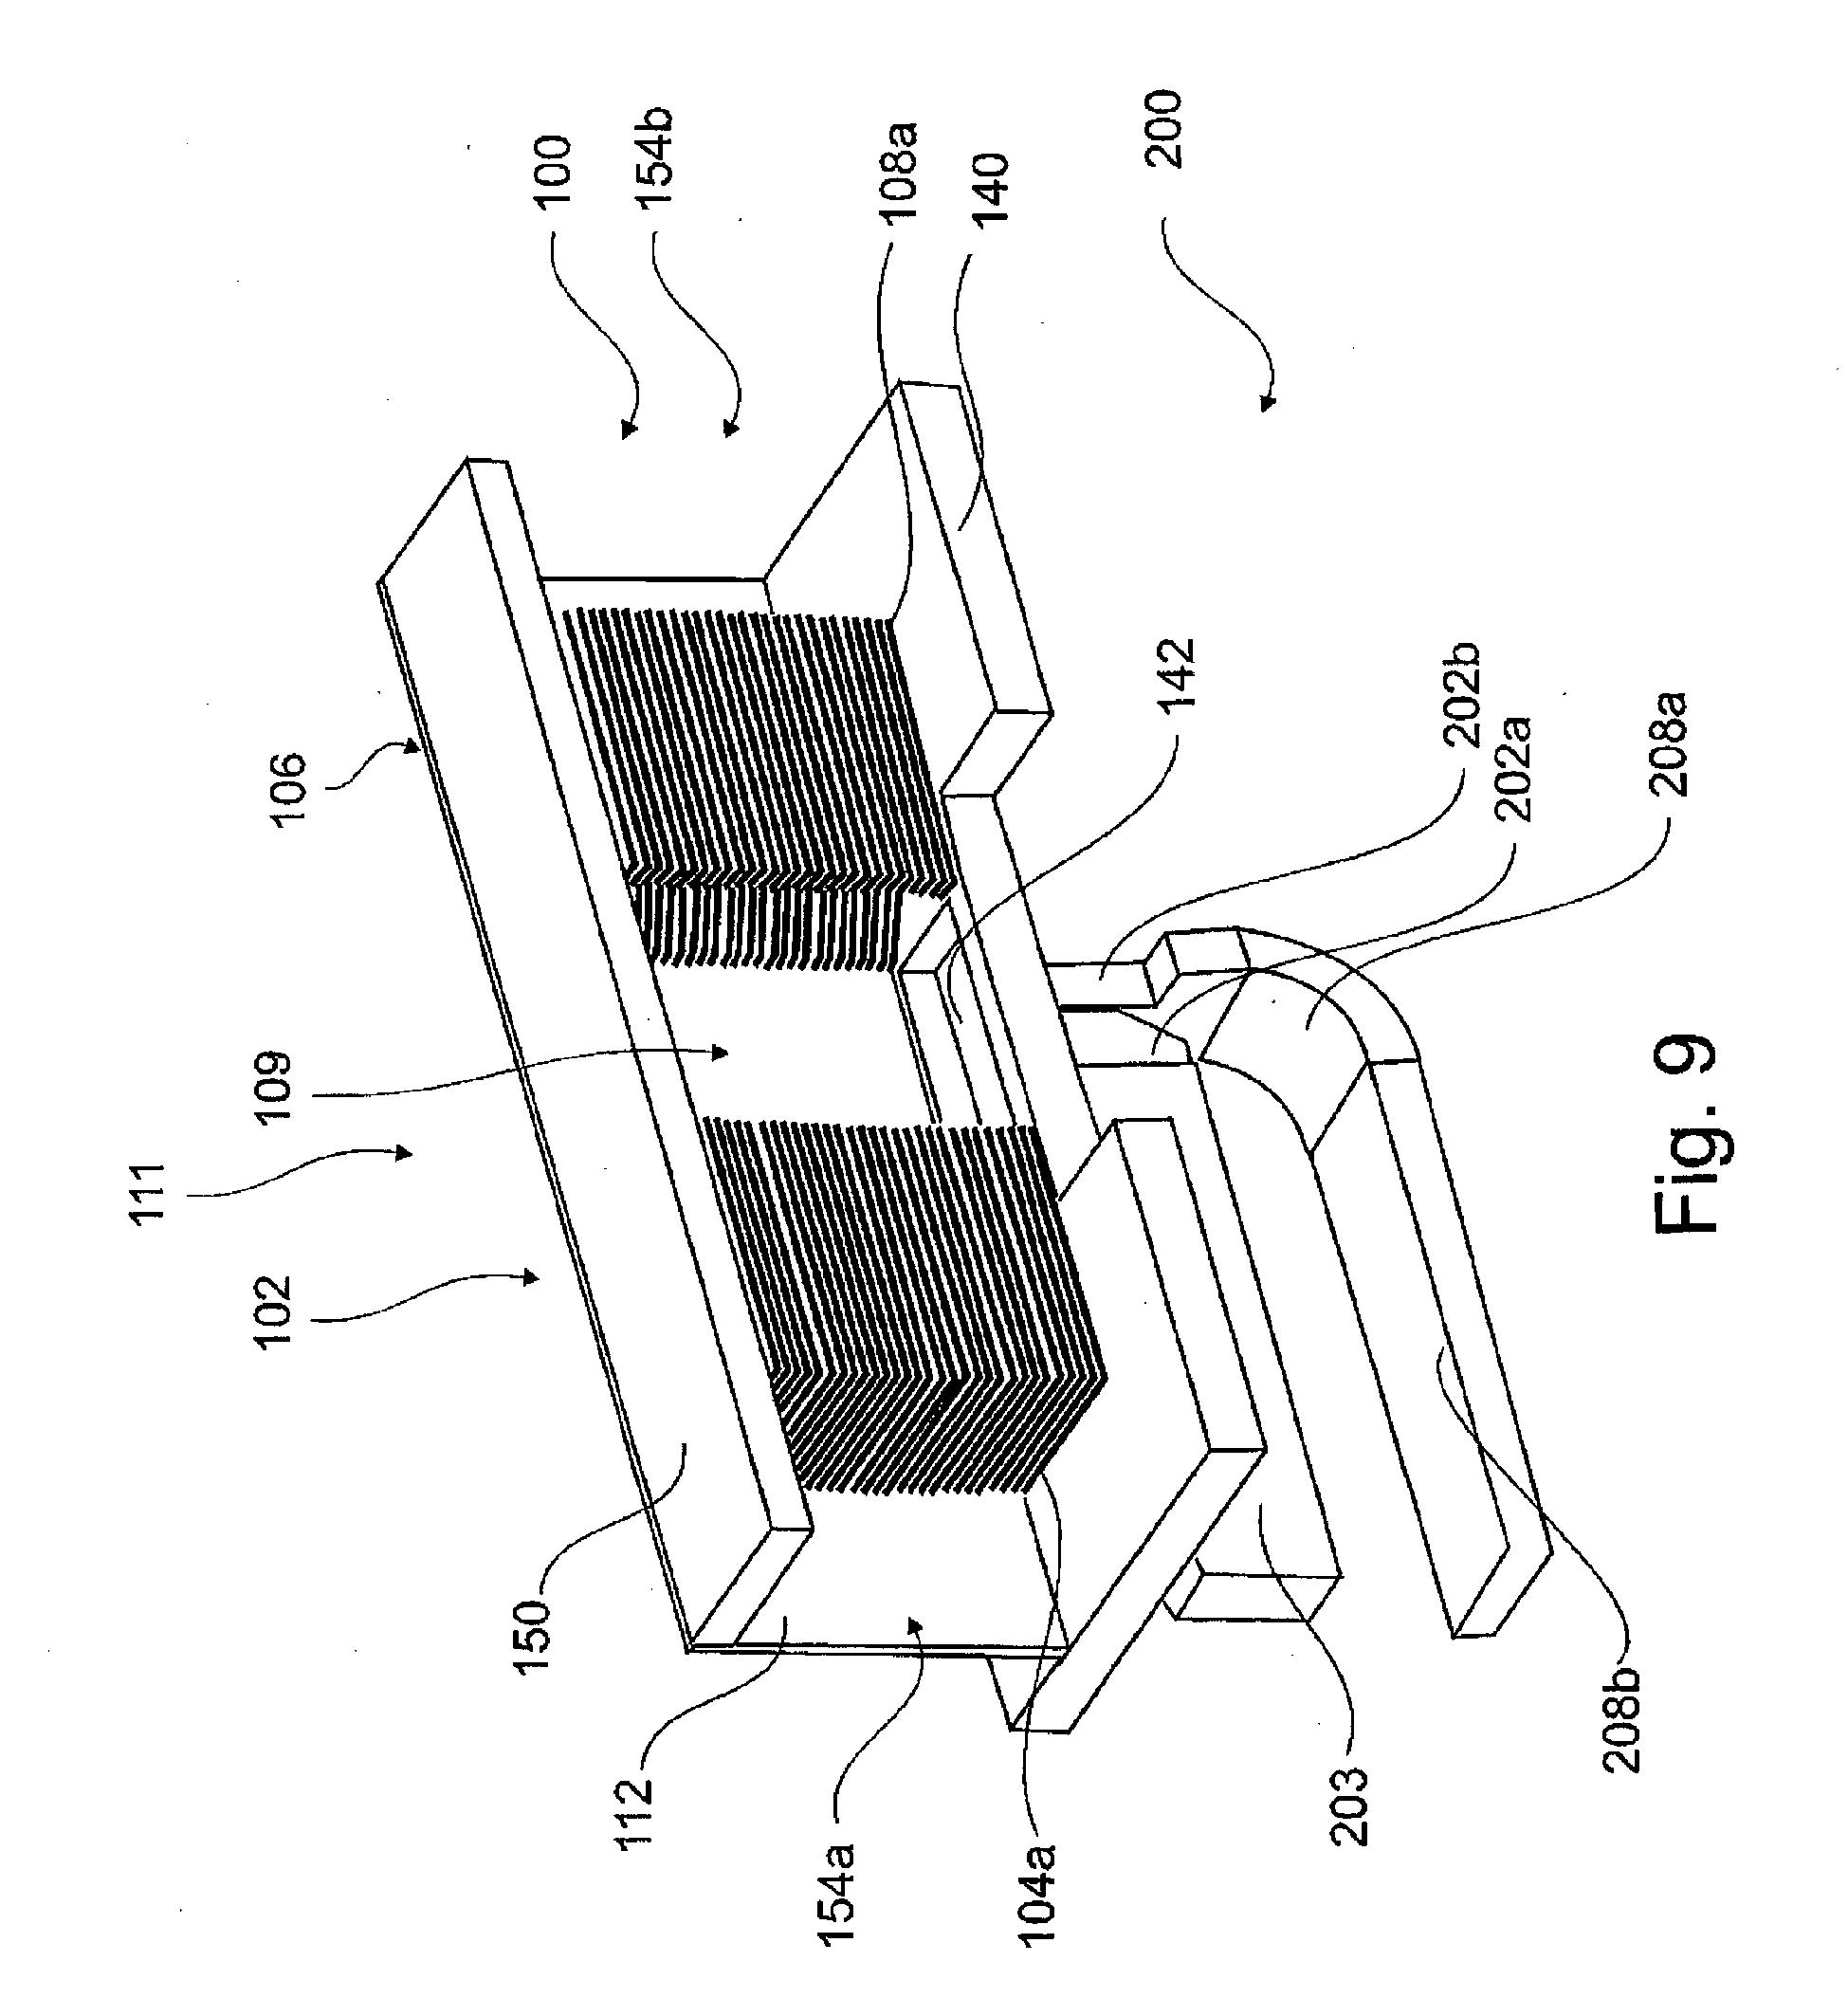 patent ep2559043b1